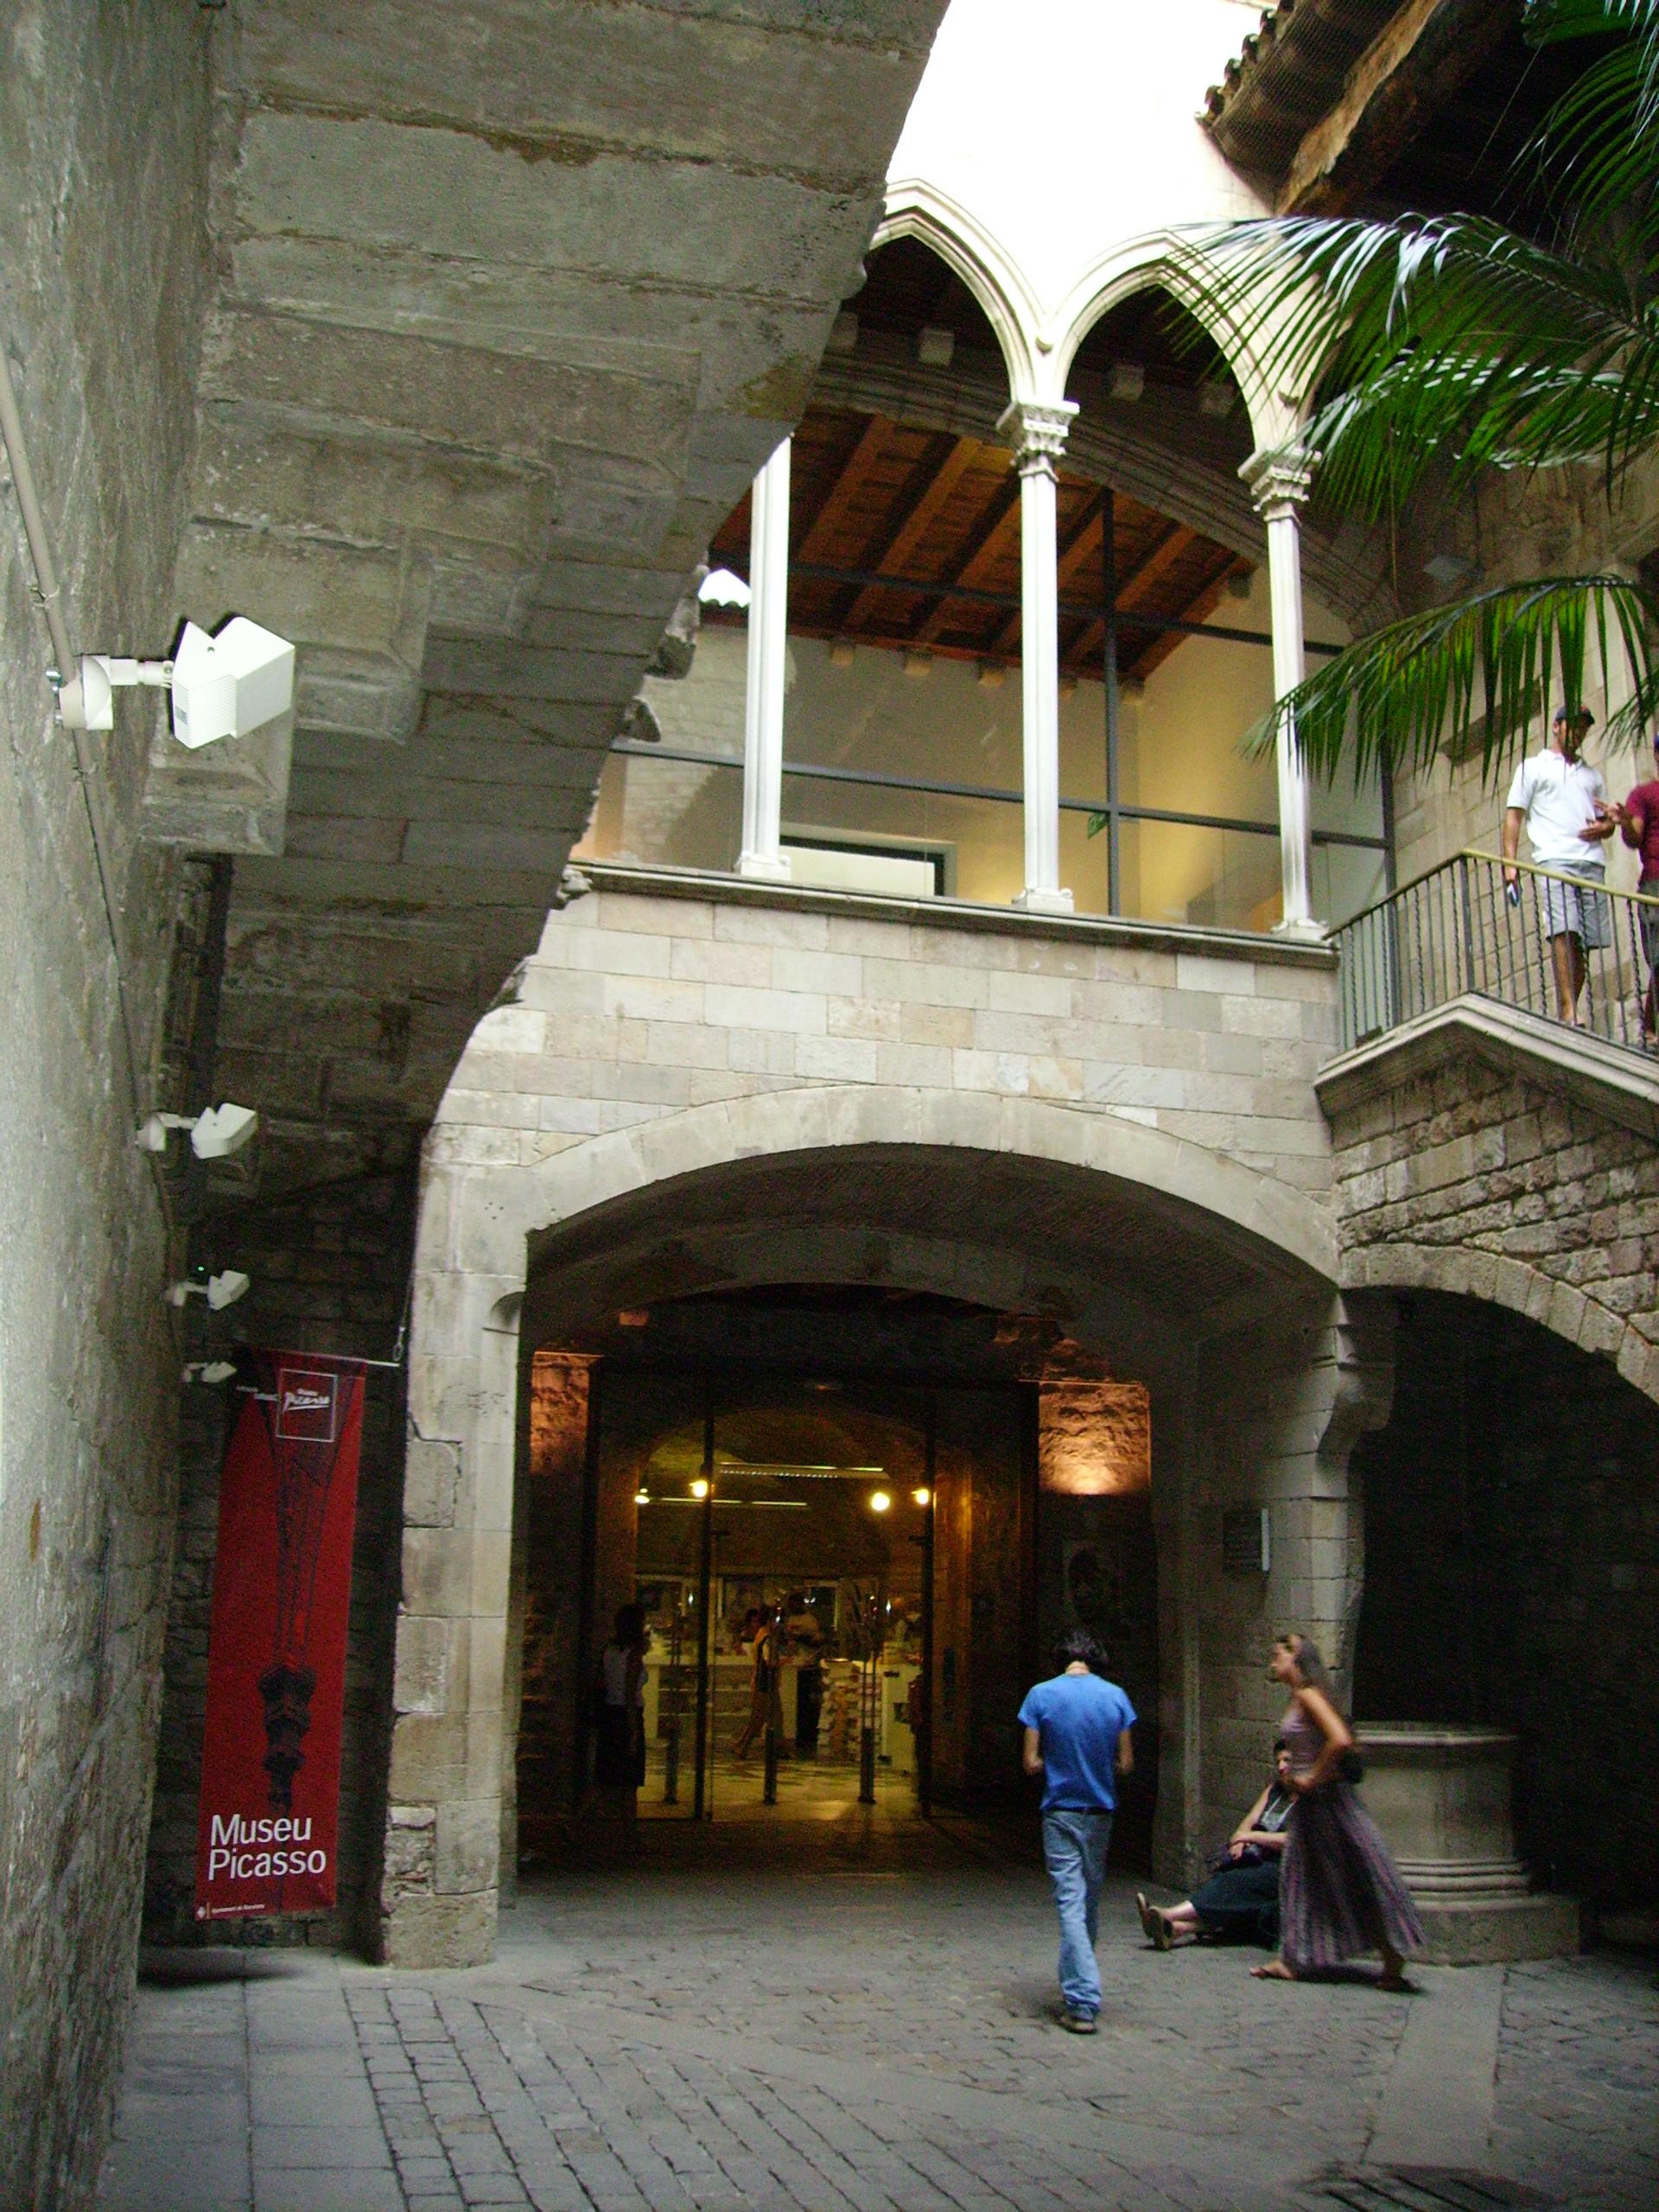 File:Museu Picasso Barcelona.JPG